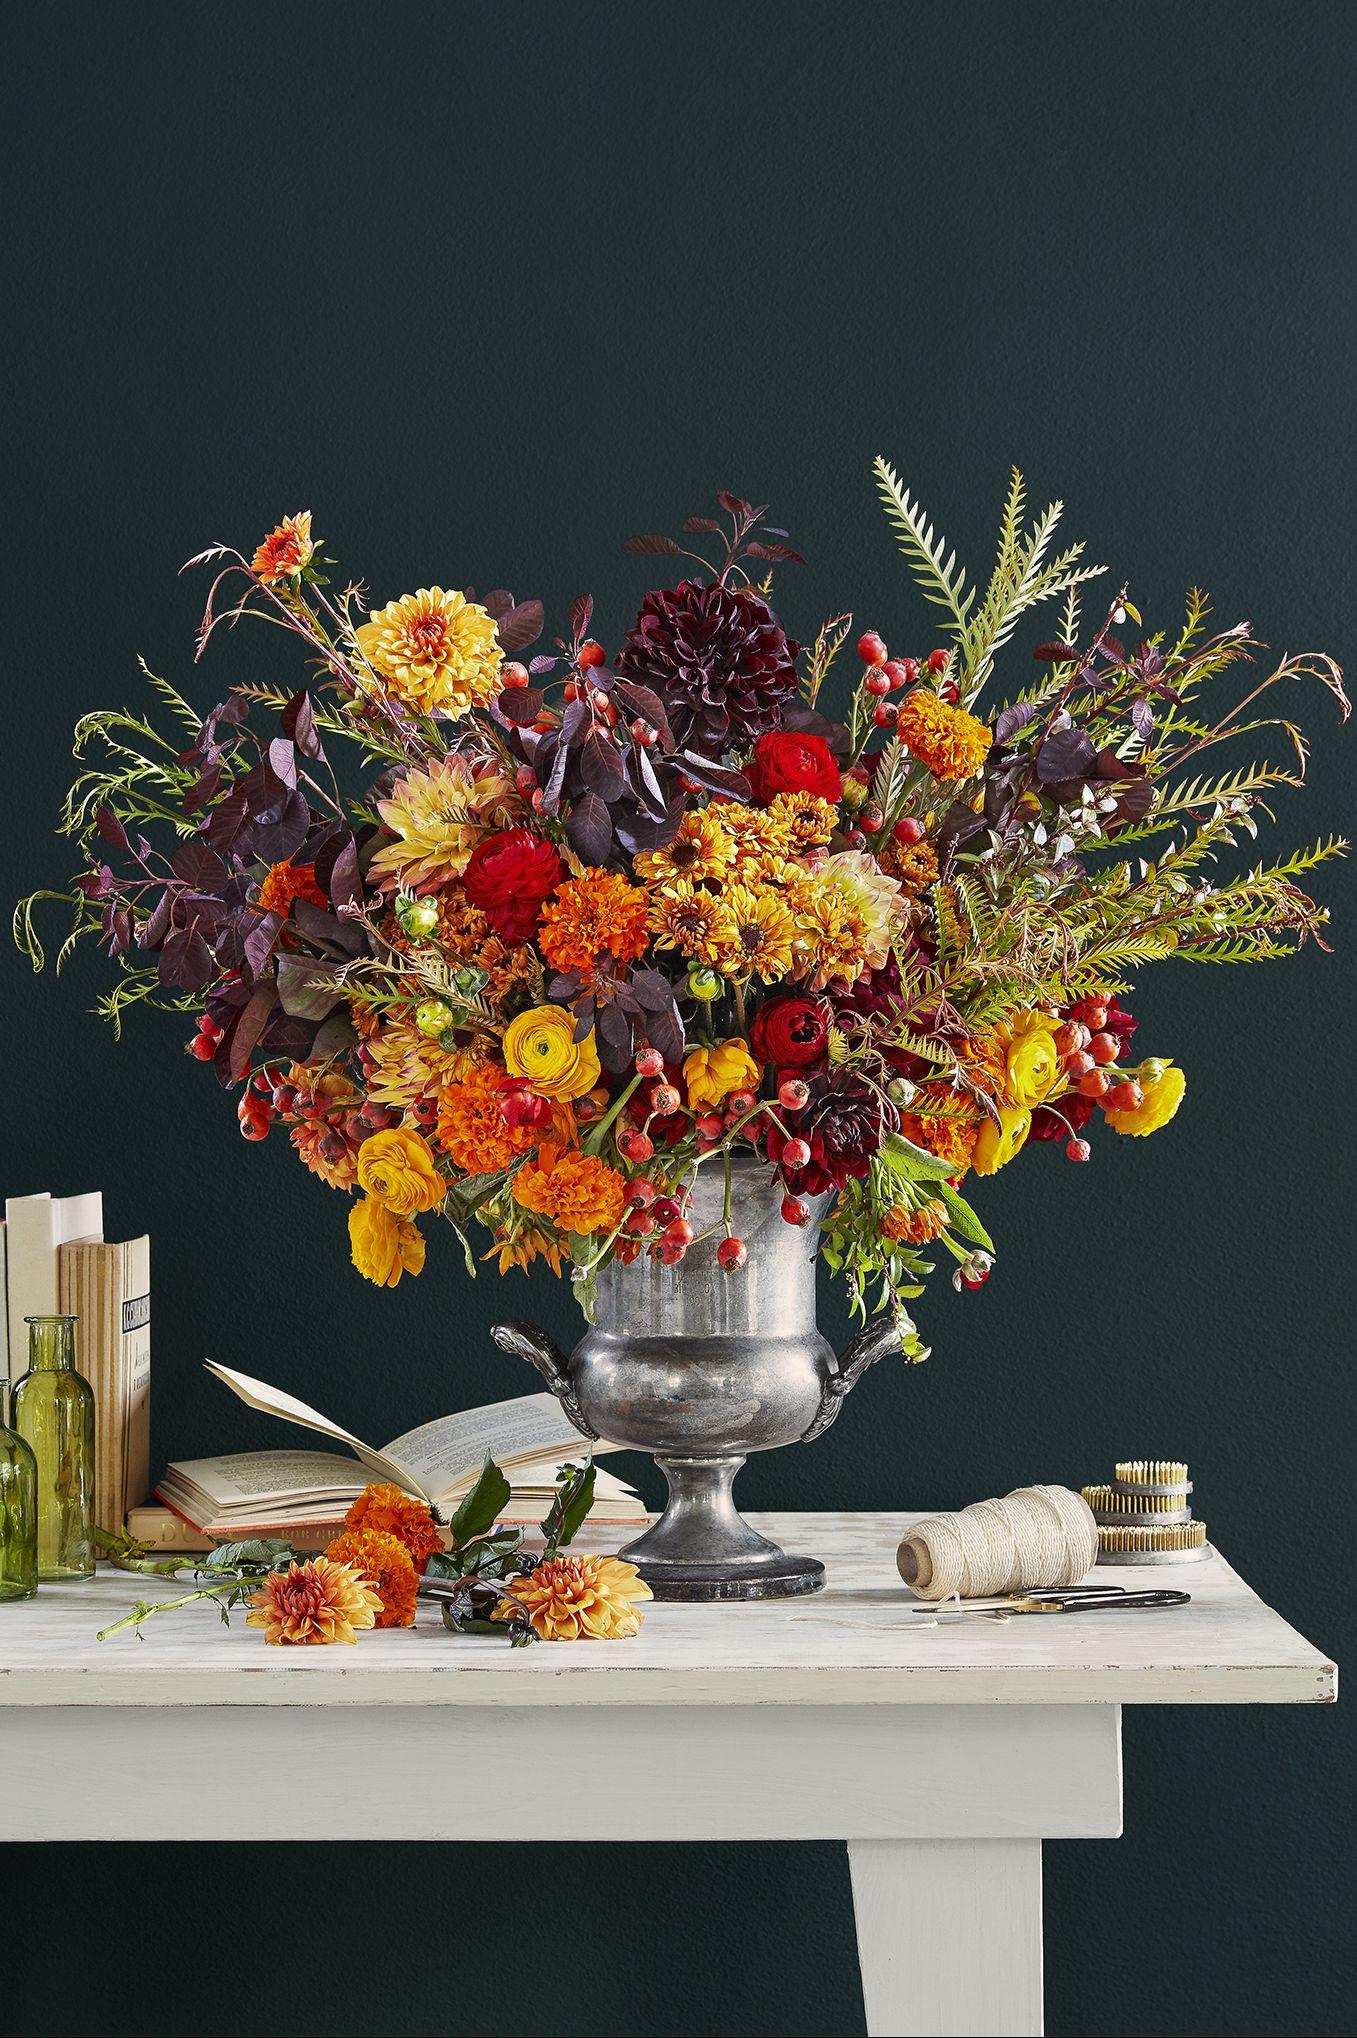 43 Fall Table Centerpieces Autumn Centerpiece Ideas